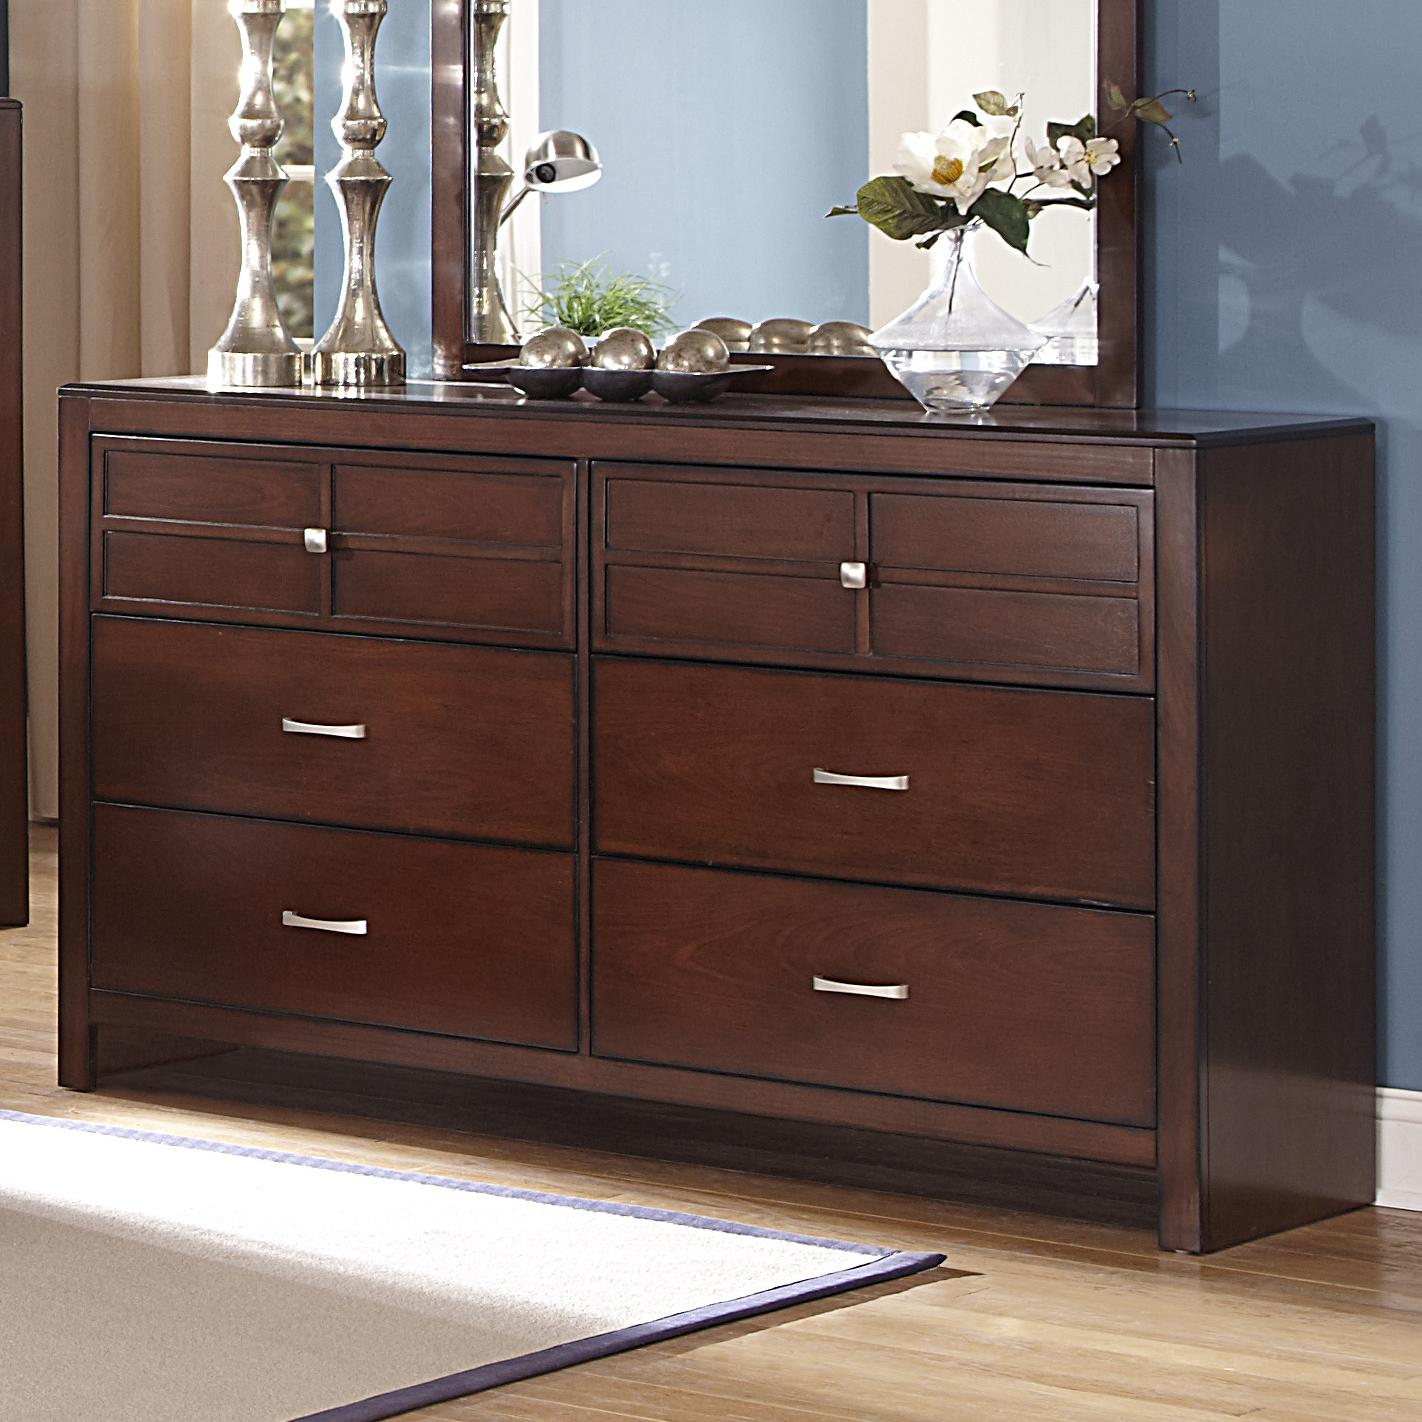 New Classic Kensington 6-Drawer Dresser - Item Number: 00-060-050